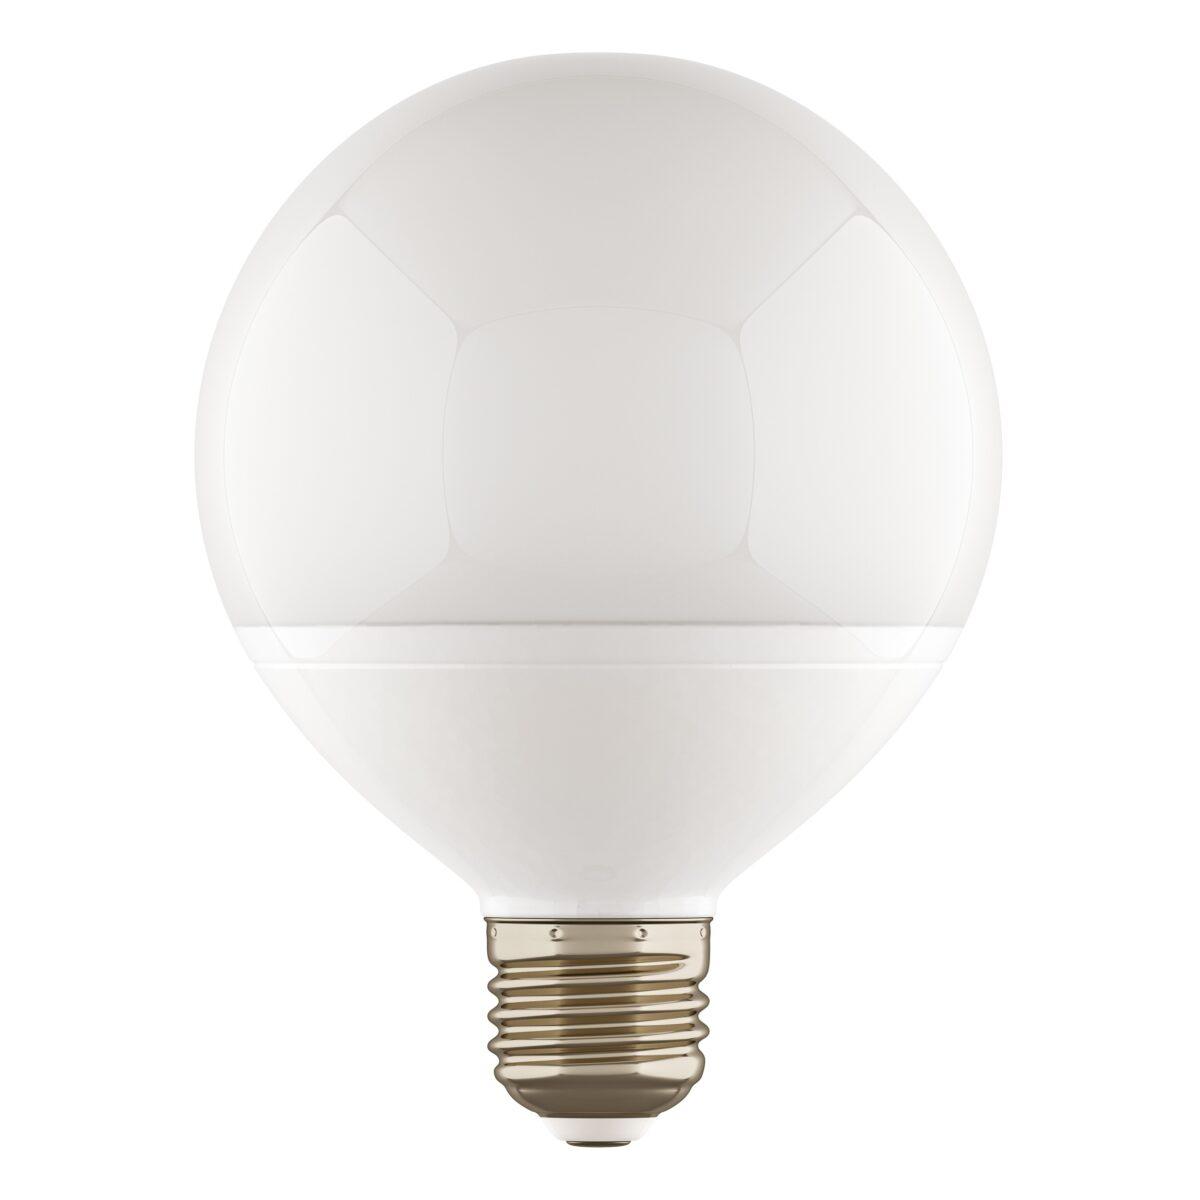 930314 Лампа LED 220V G95 E27 13W=130W 1100LM 180G FR 4000K 20000H (в комплекте)